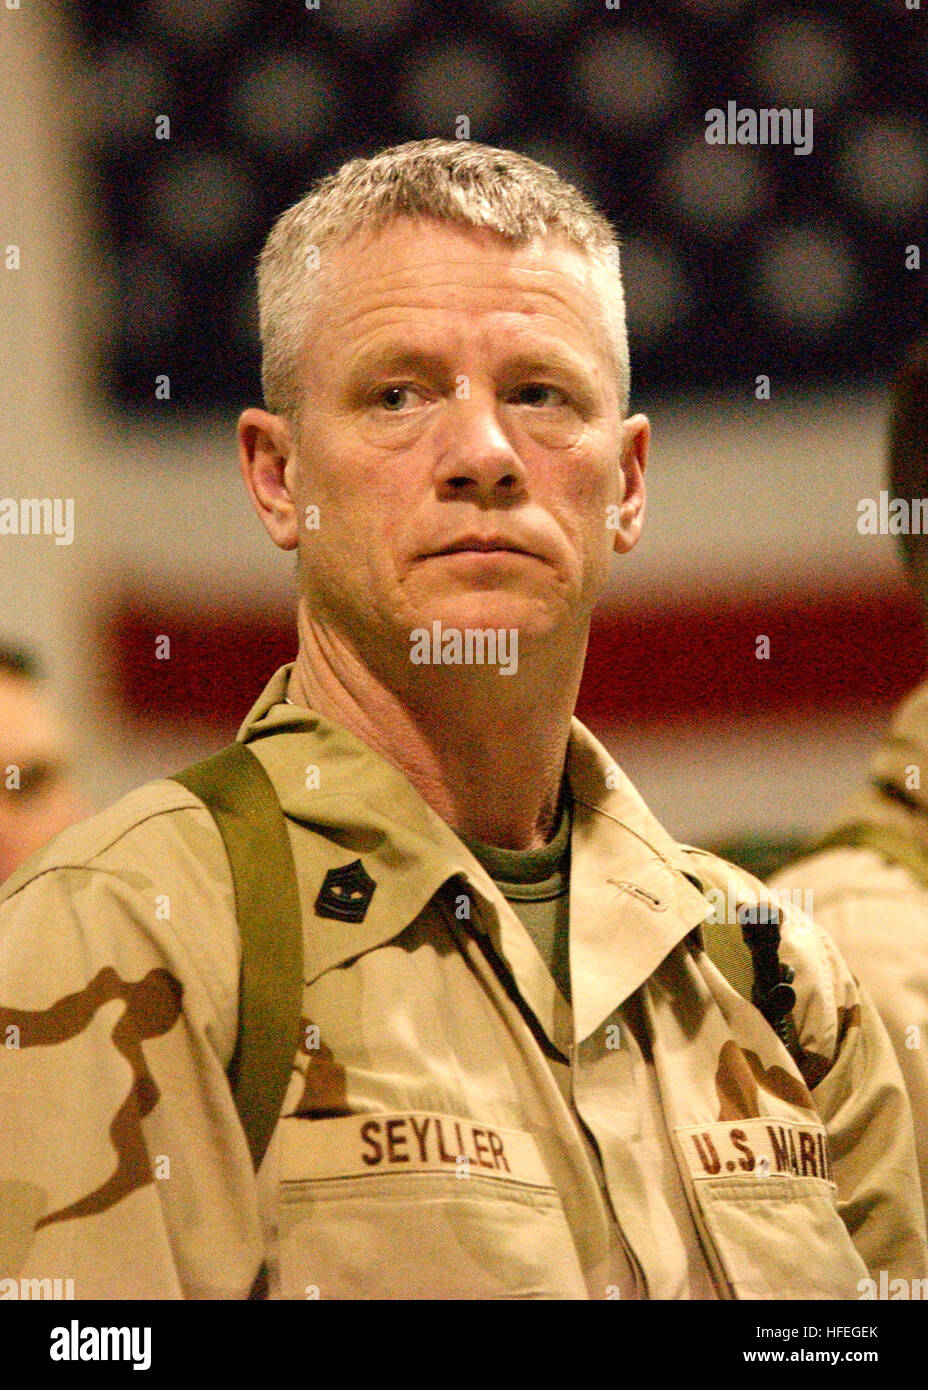 030313-N-5576W-007     Milwaukee, Wis. (Mar. 13, 2003) Ð U.S. Marine Reservist Master Gunnery Sgt. Steve Seyller - Stock Image